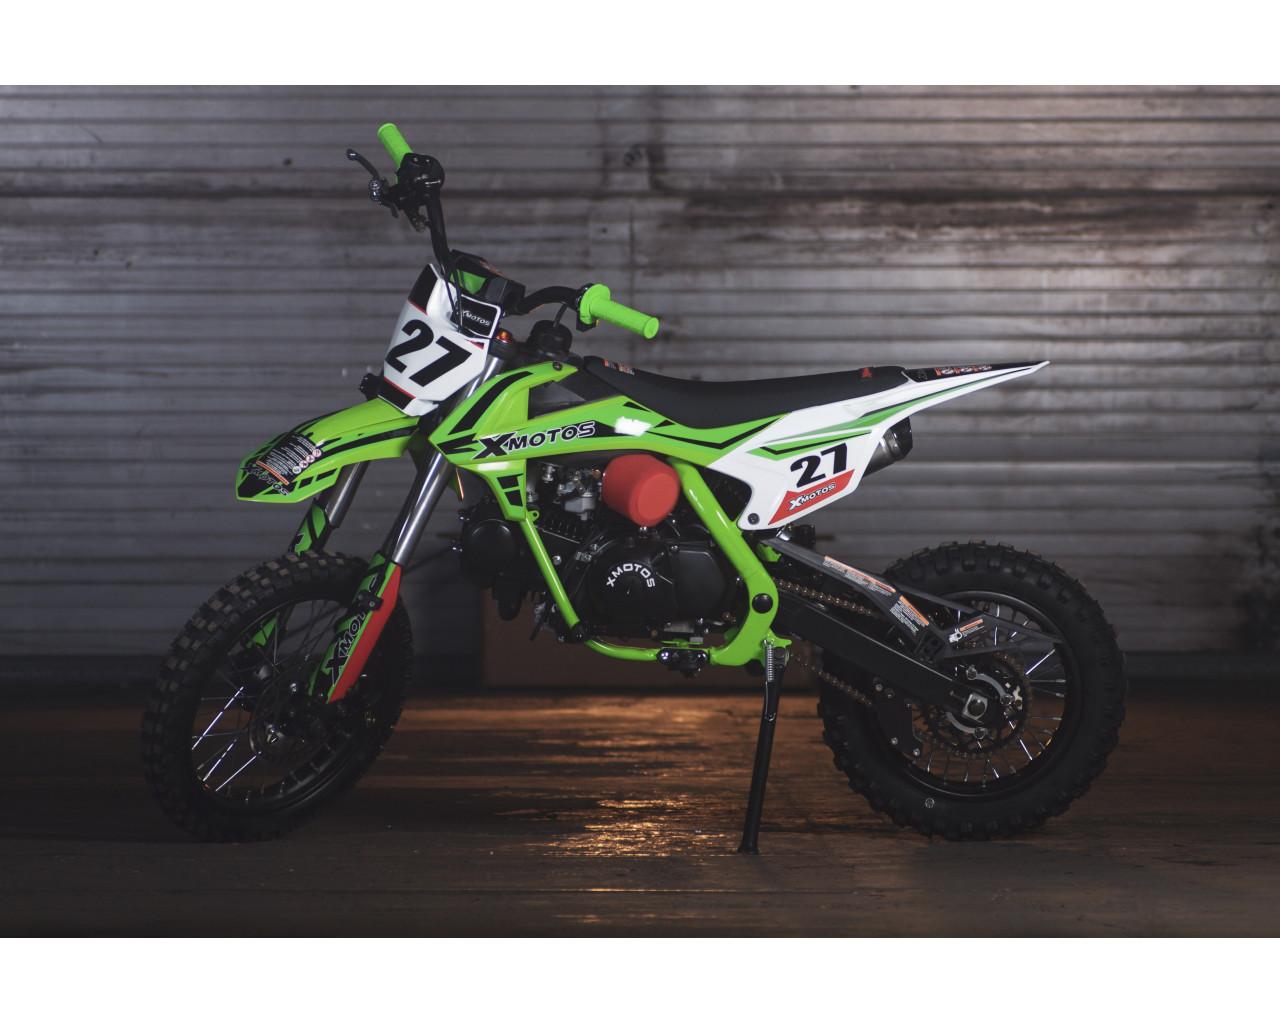 Xmotos XB27 125cc